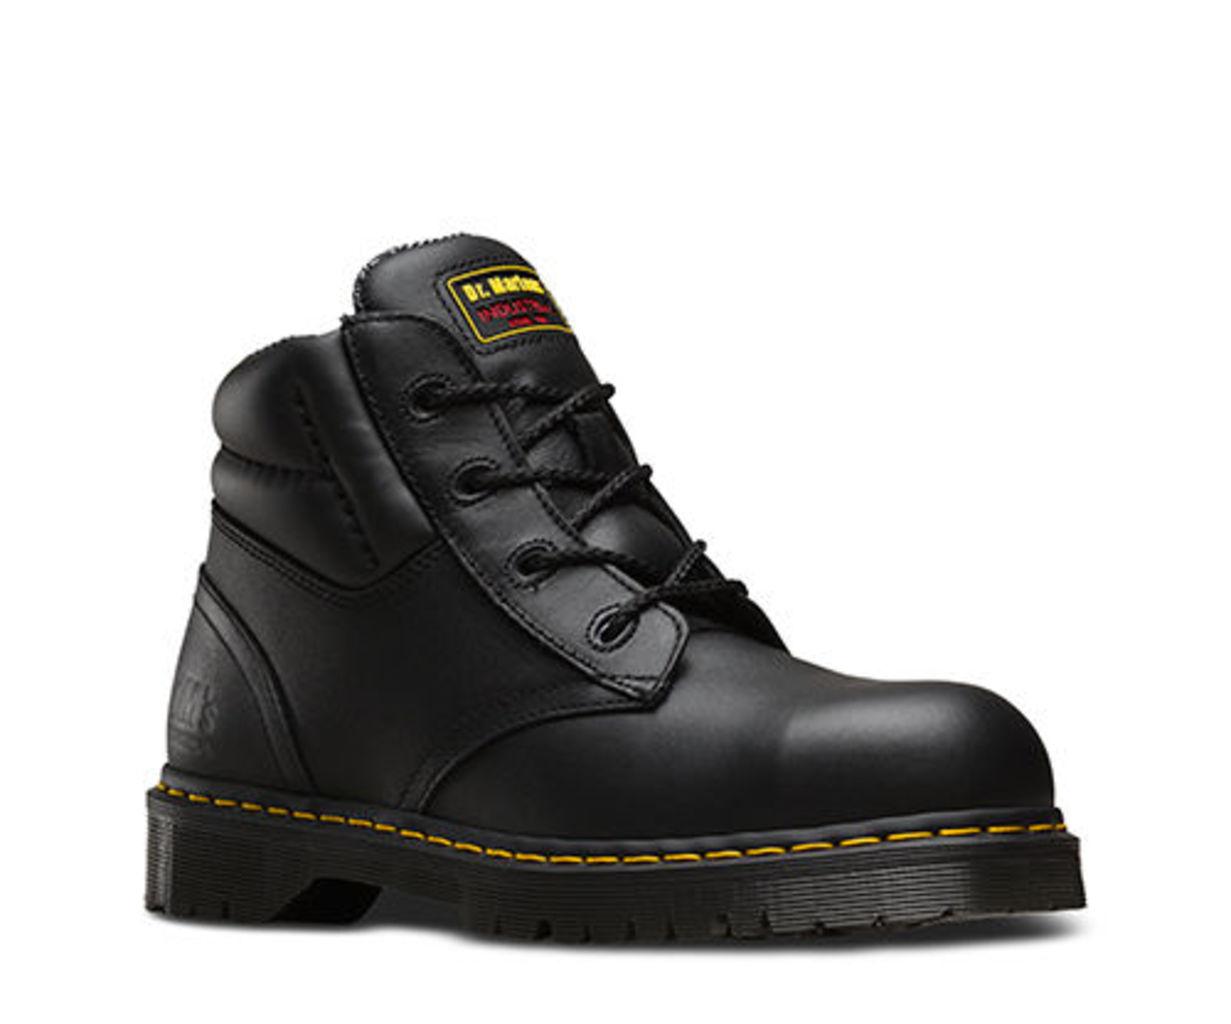 Icon 7b09 Ssf Boot